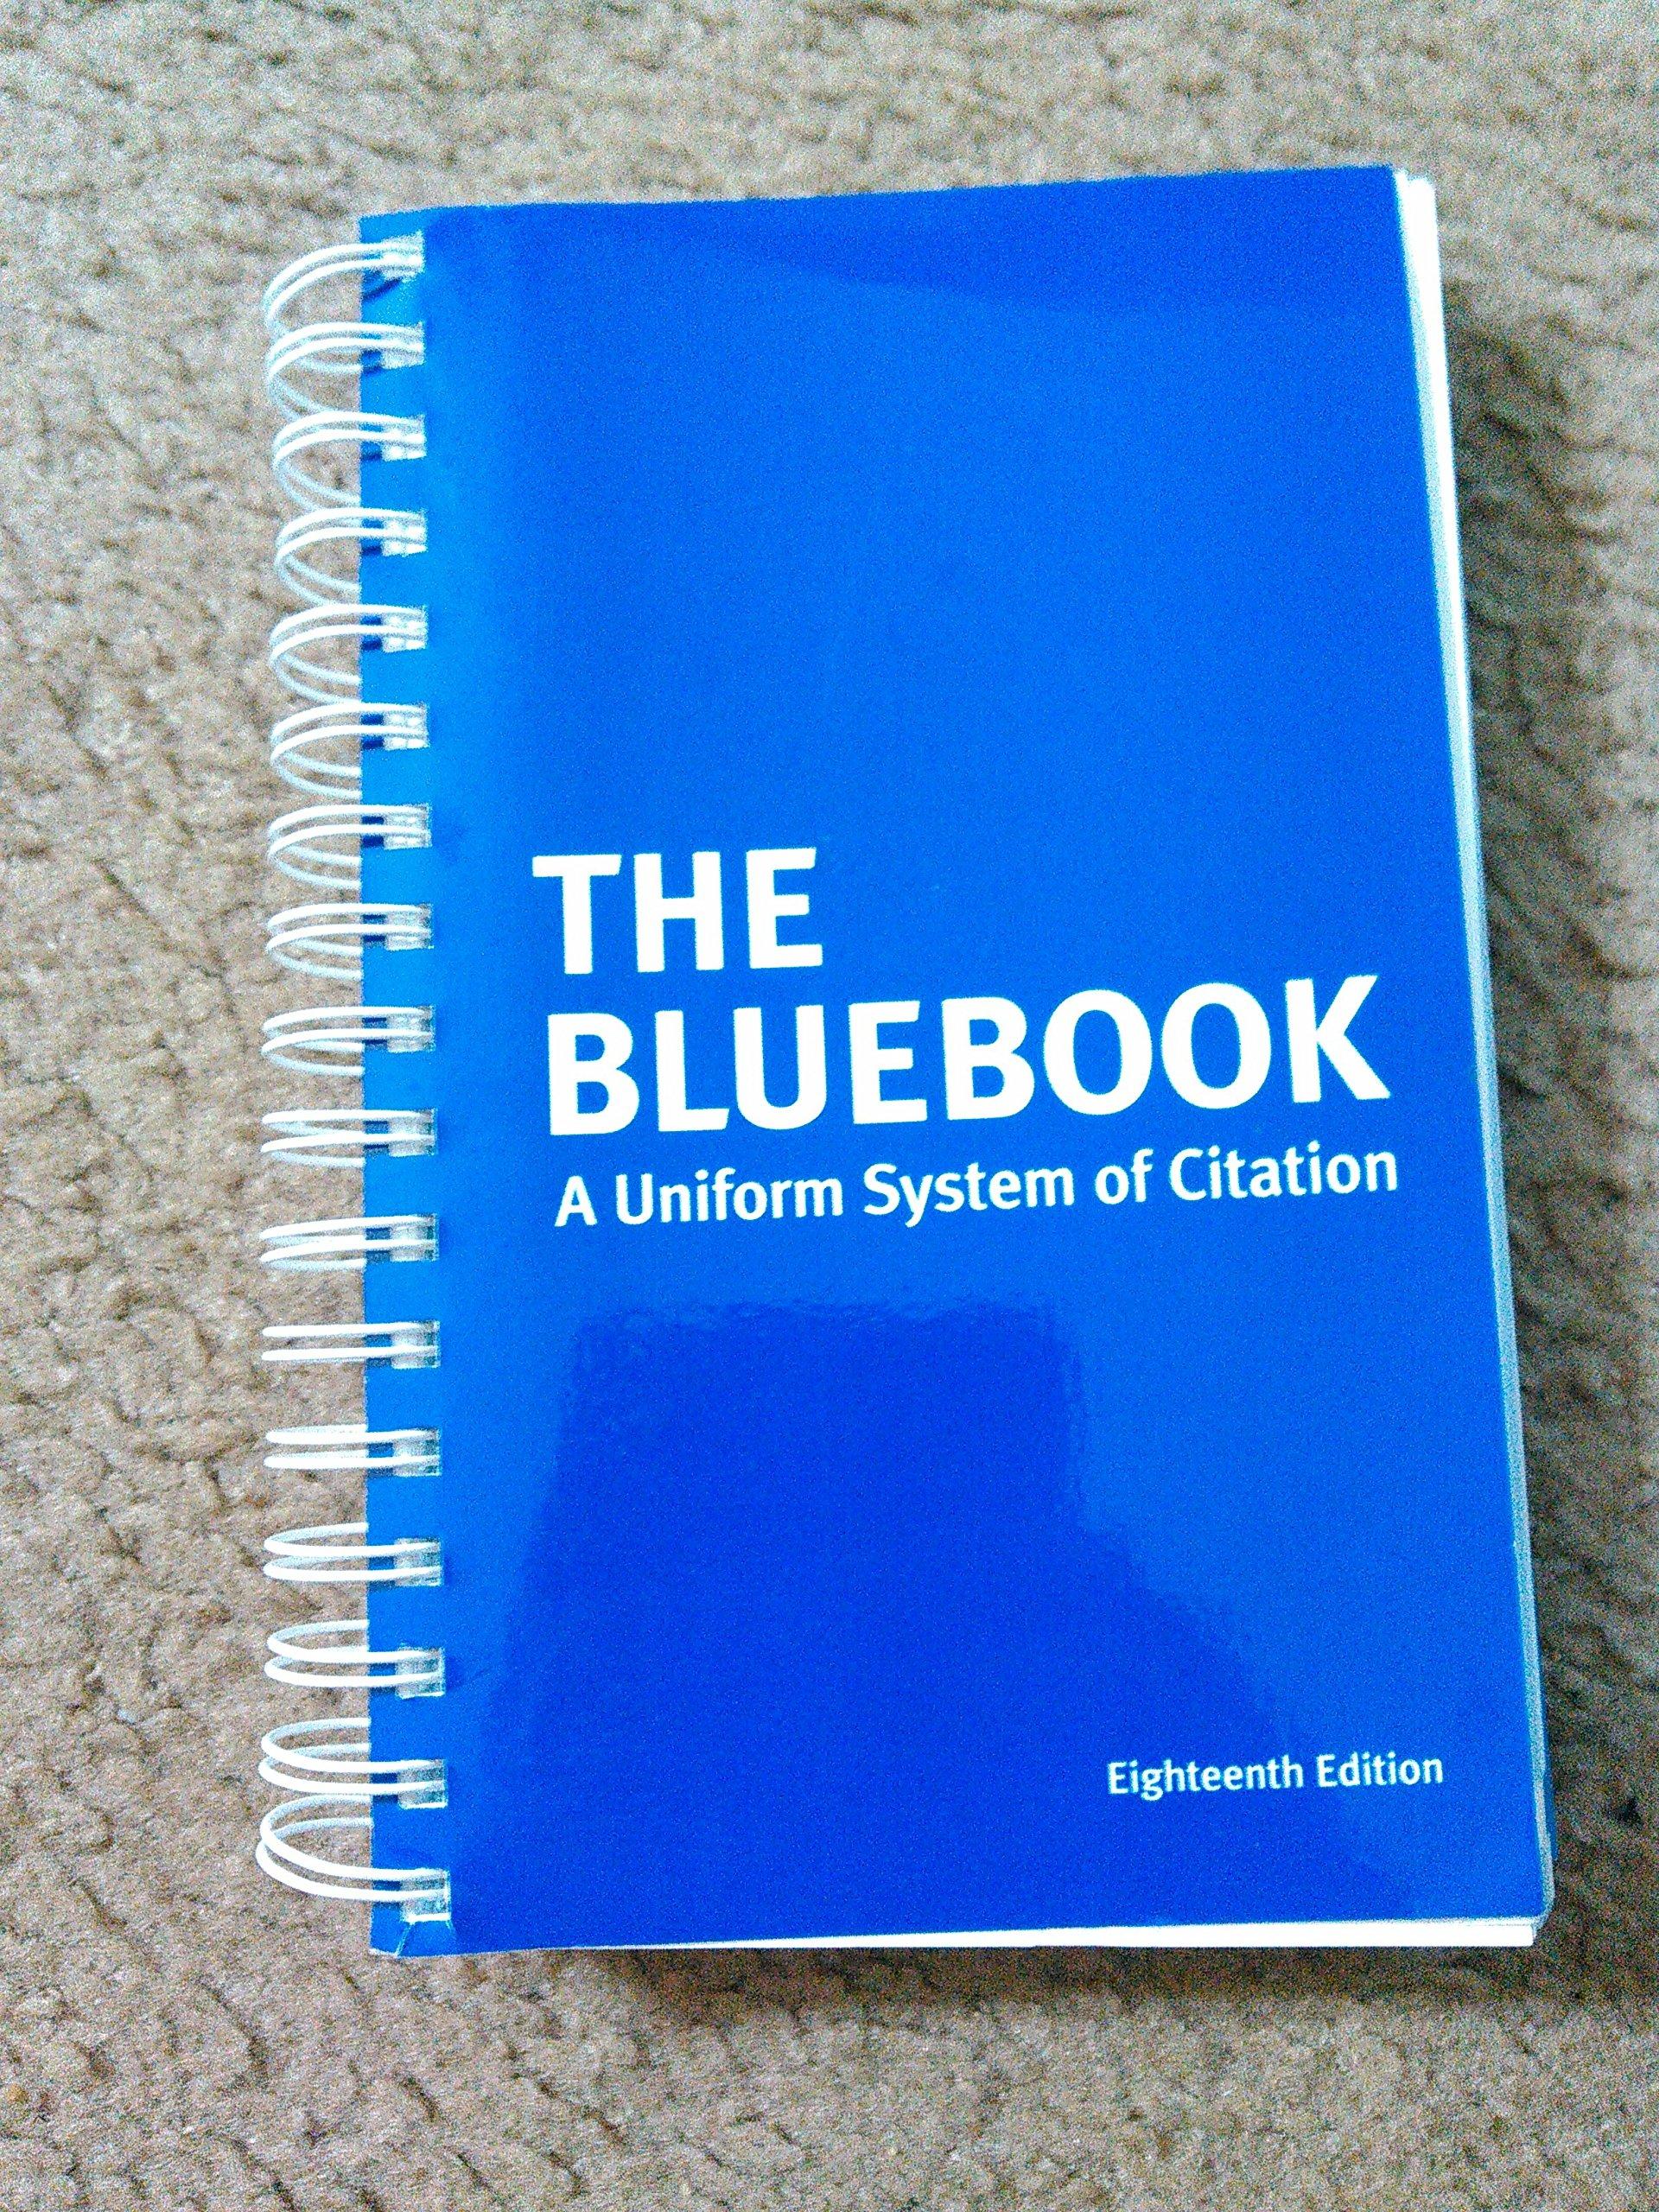 Bluebook a uniform system of citation 9786000143299 amazon bluebook a uniform system of citation 9786000143299 amazon books ccuart Image collections